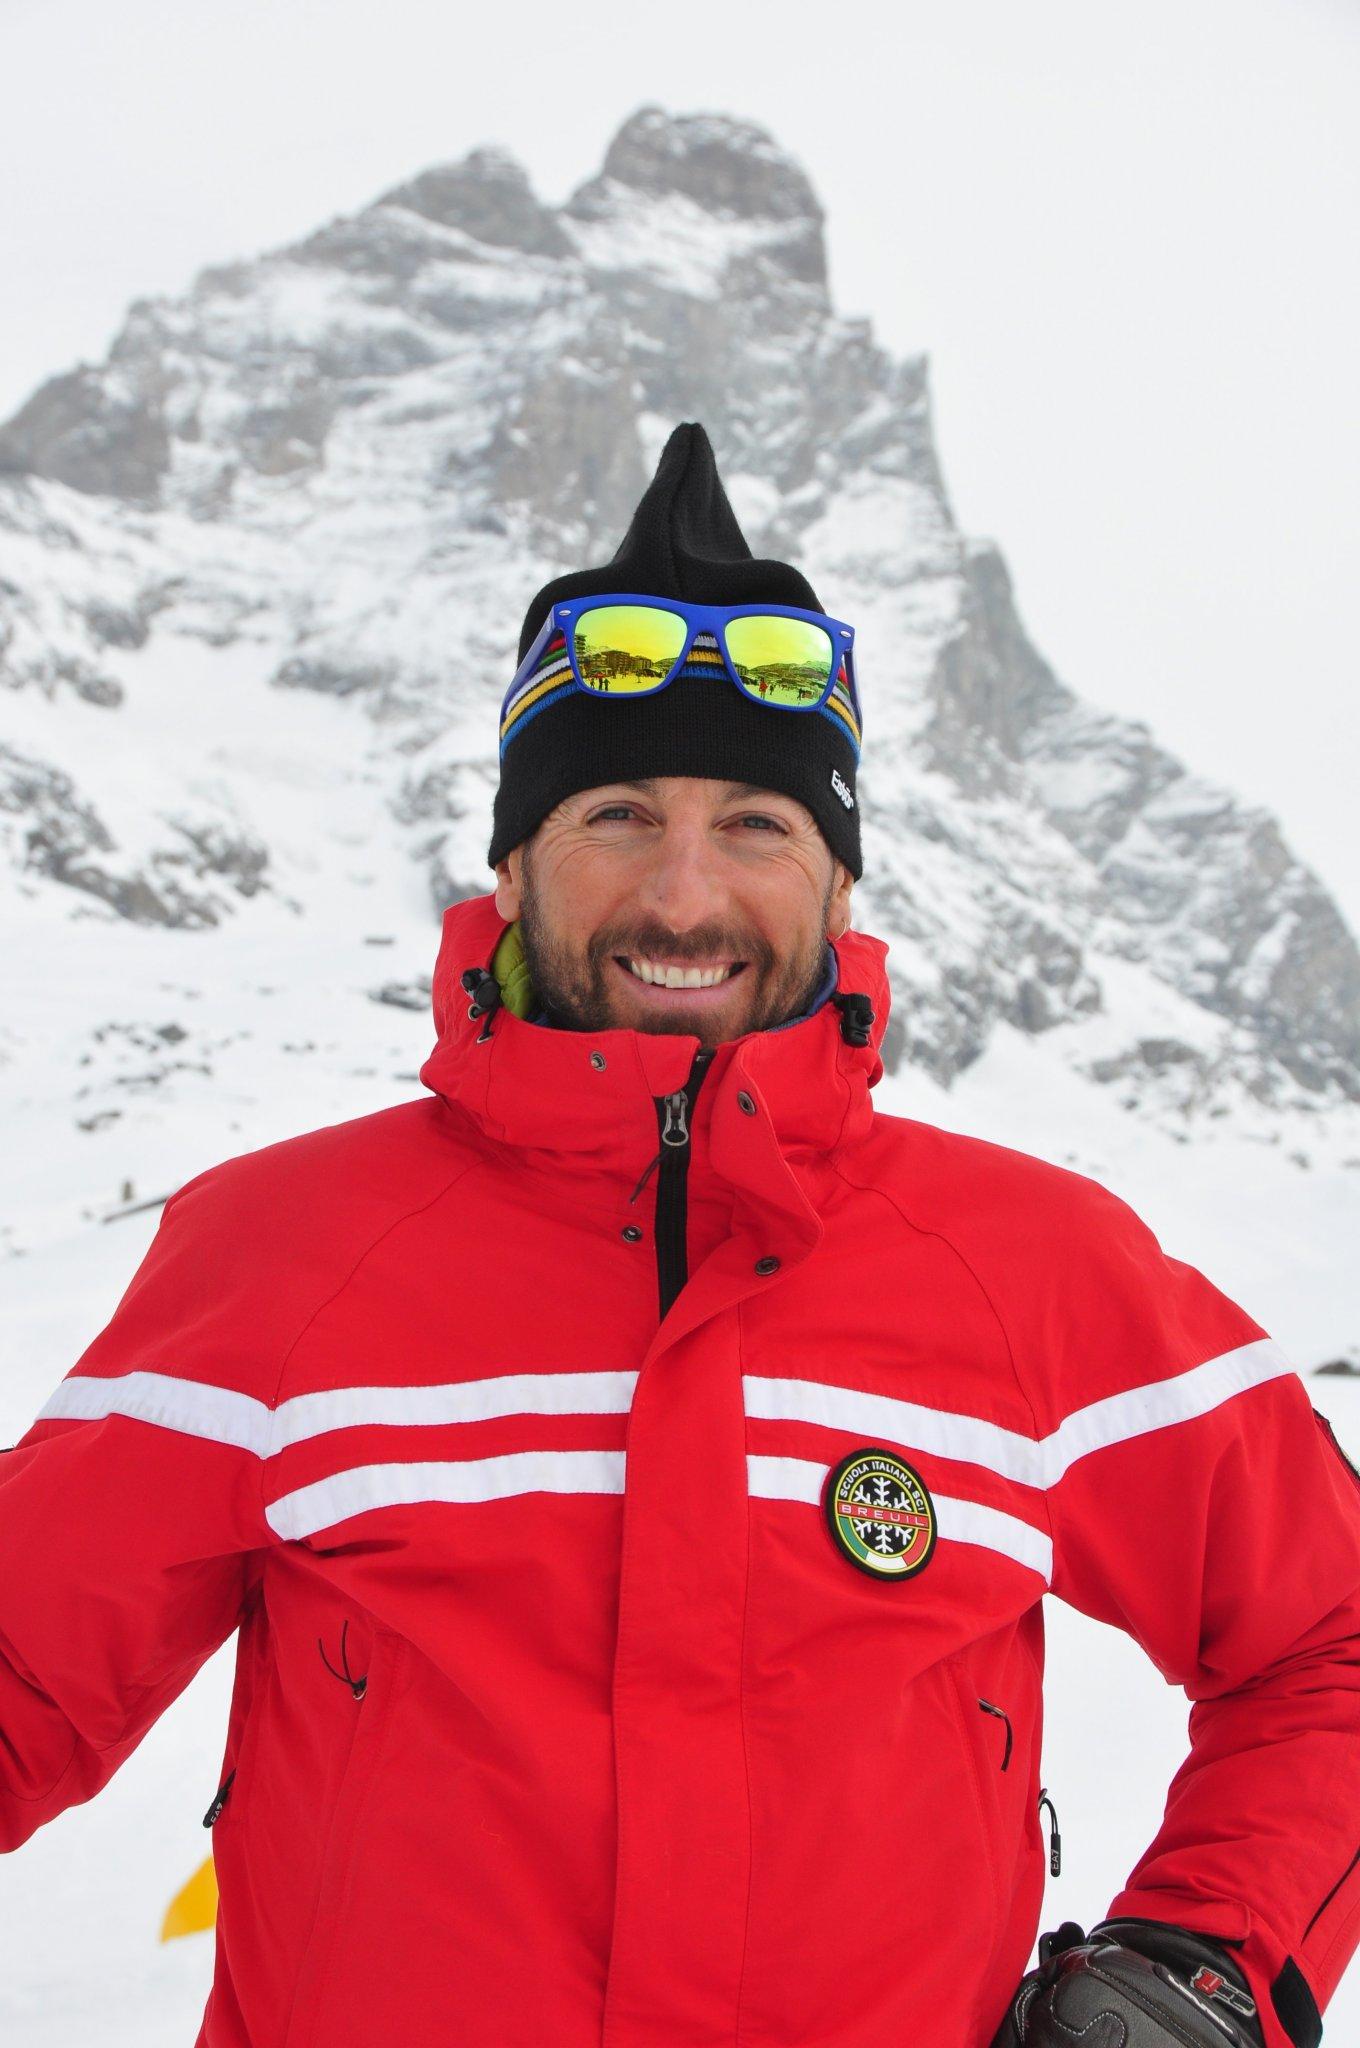 Mattia Roncoroni